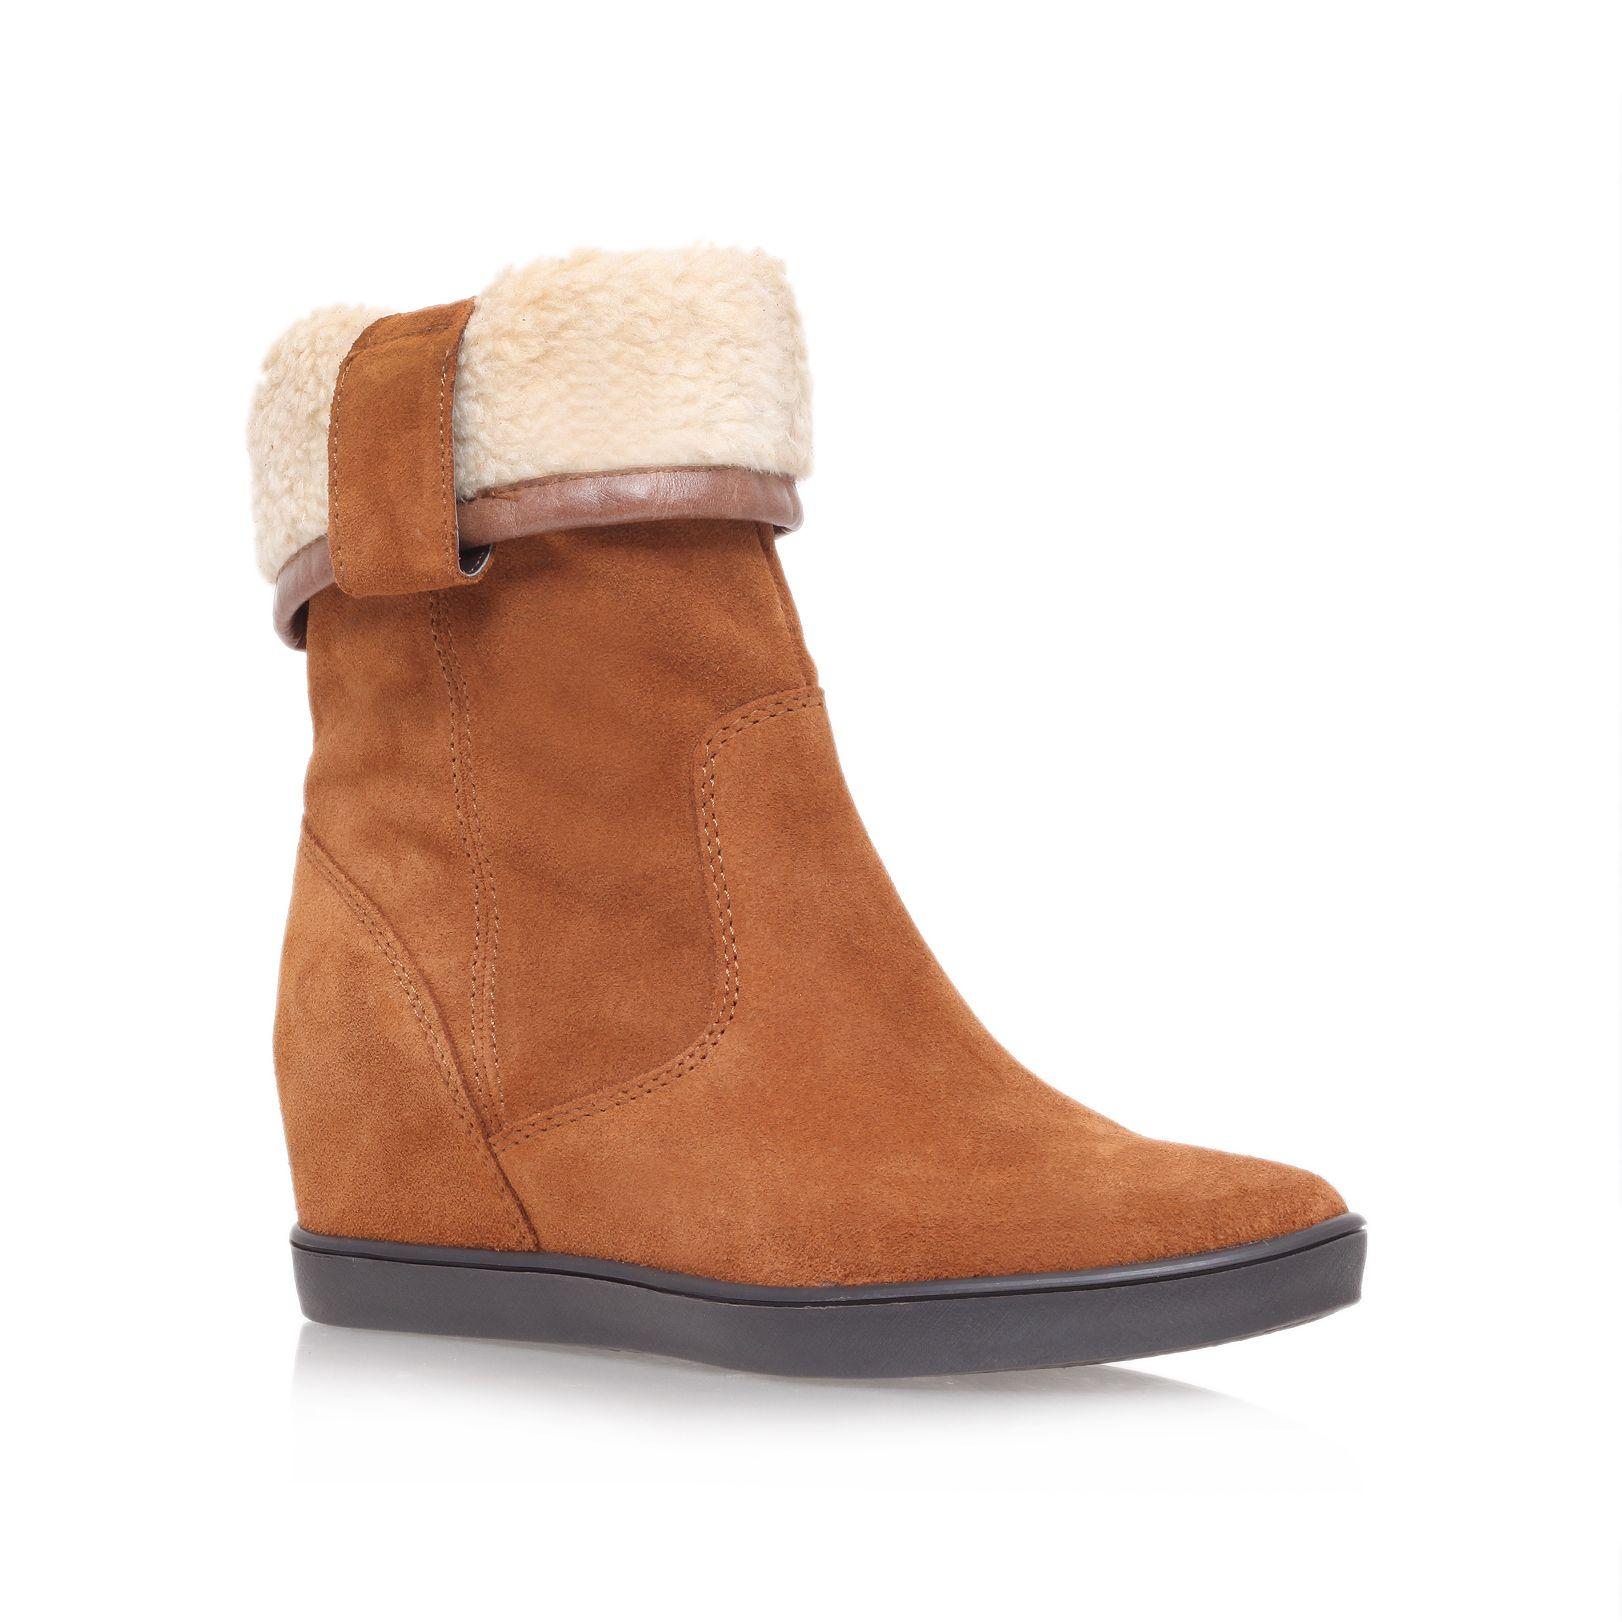 carvela kurt geiger shore low heel wedge ankle boots in